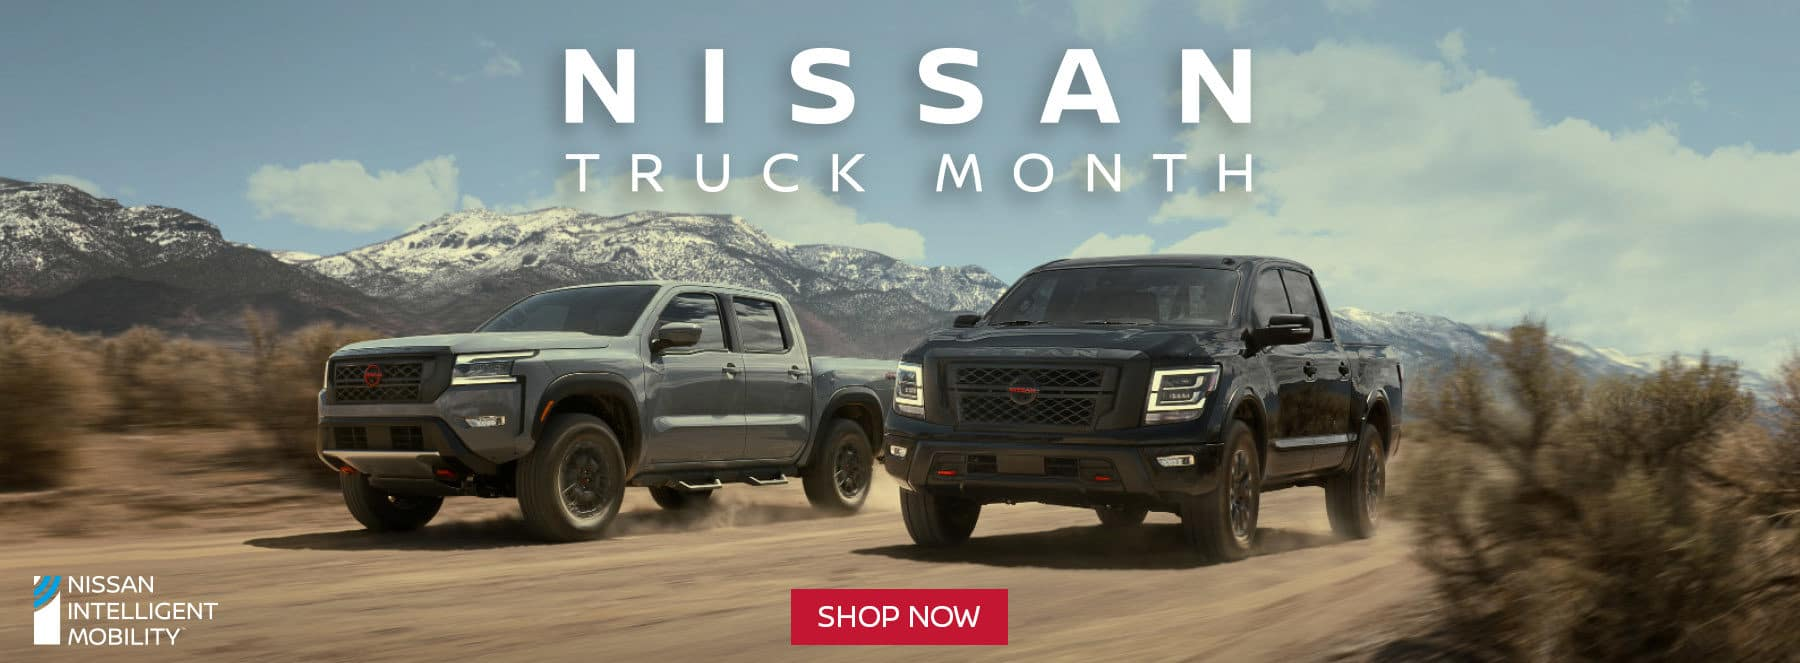 MDNI-TruckMonthOct-SL Banner 1800×663